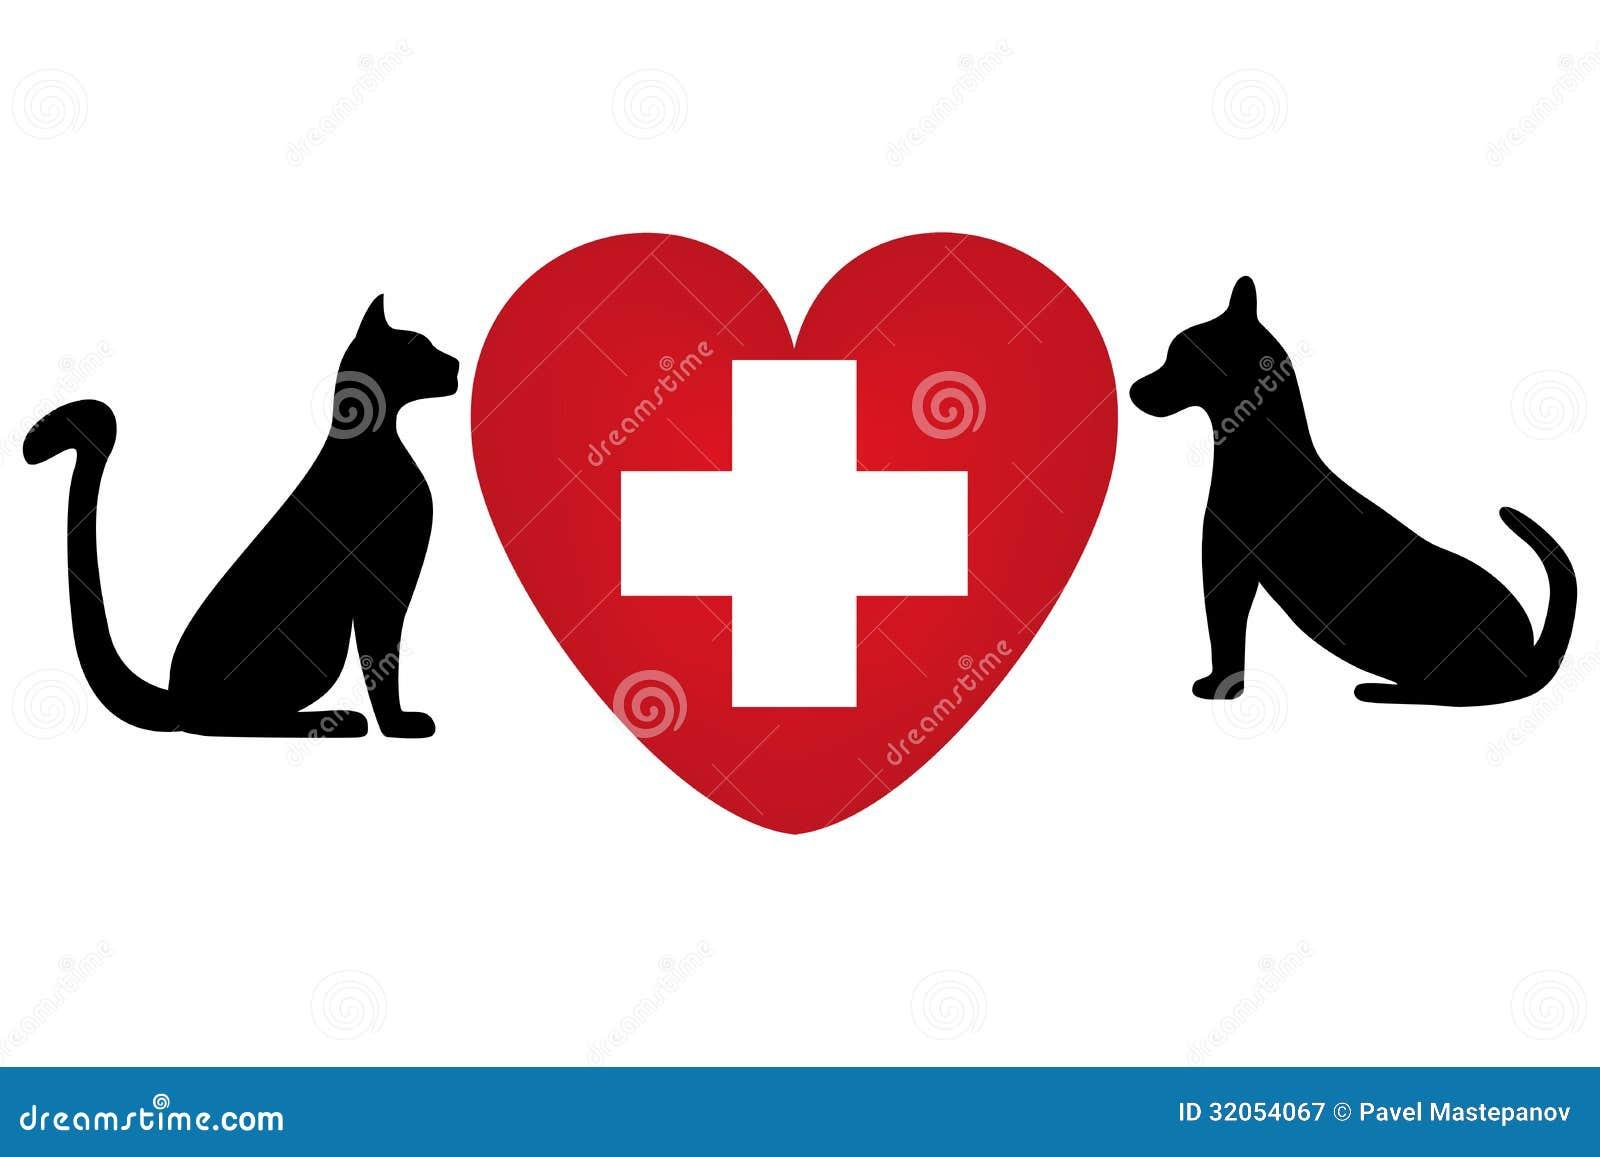 Veterinary symbol stock vector illustration of silhouette 32054067 veterinary symbol biocorpaavc Gallery